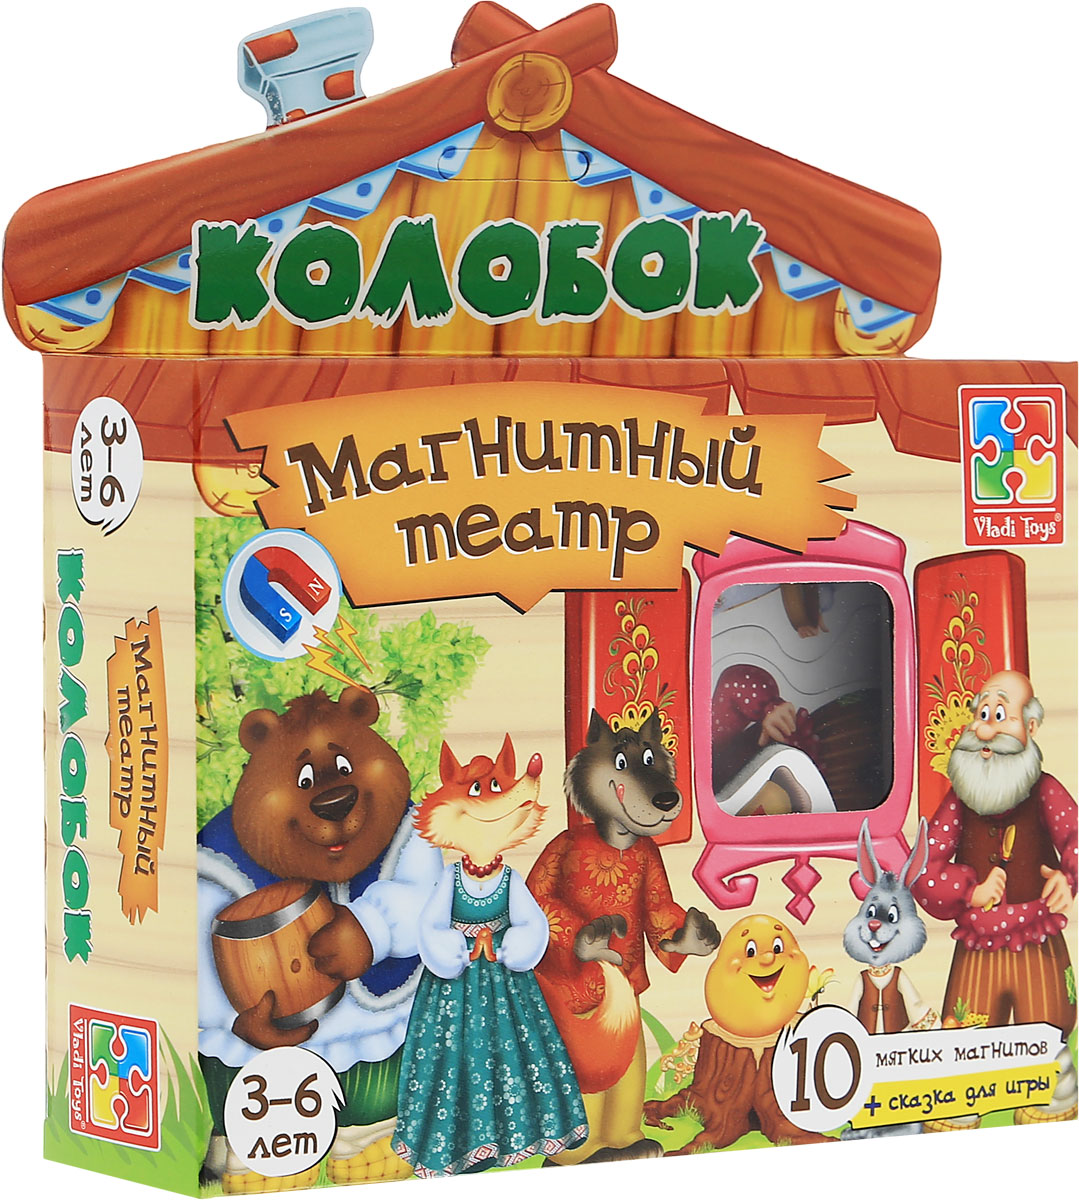 Vladi Toys Магнитный кукольный театр Колобок vladi toys магнитный кукольный театр репка